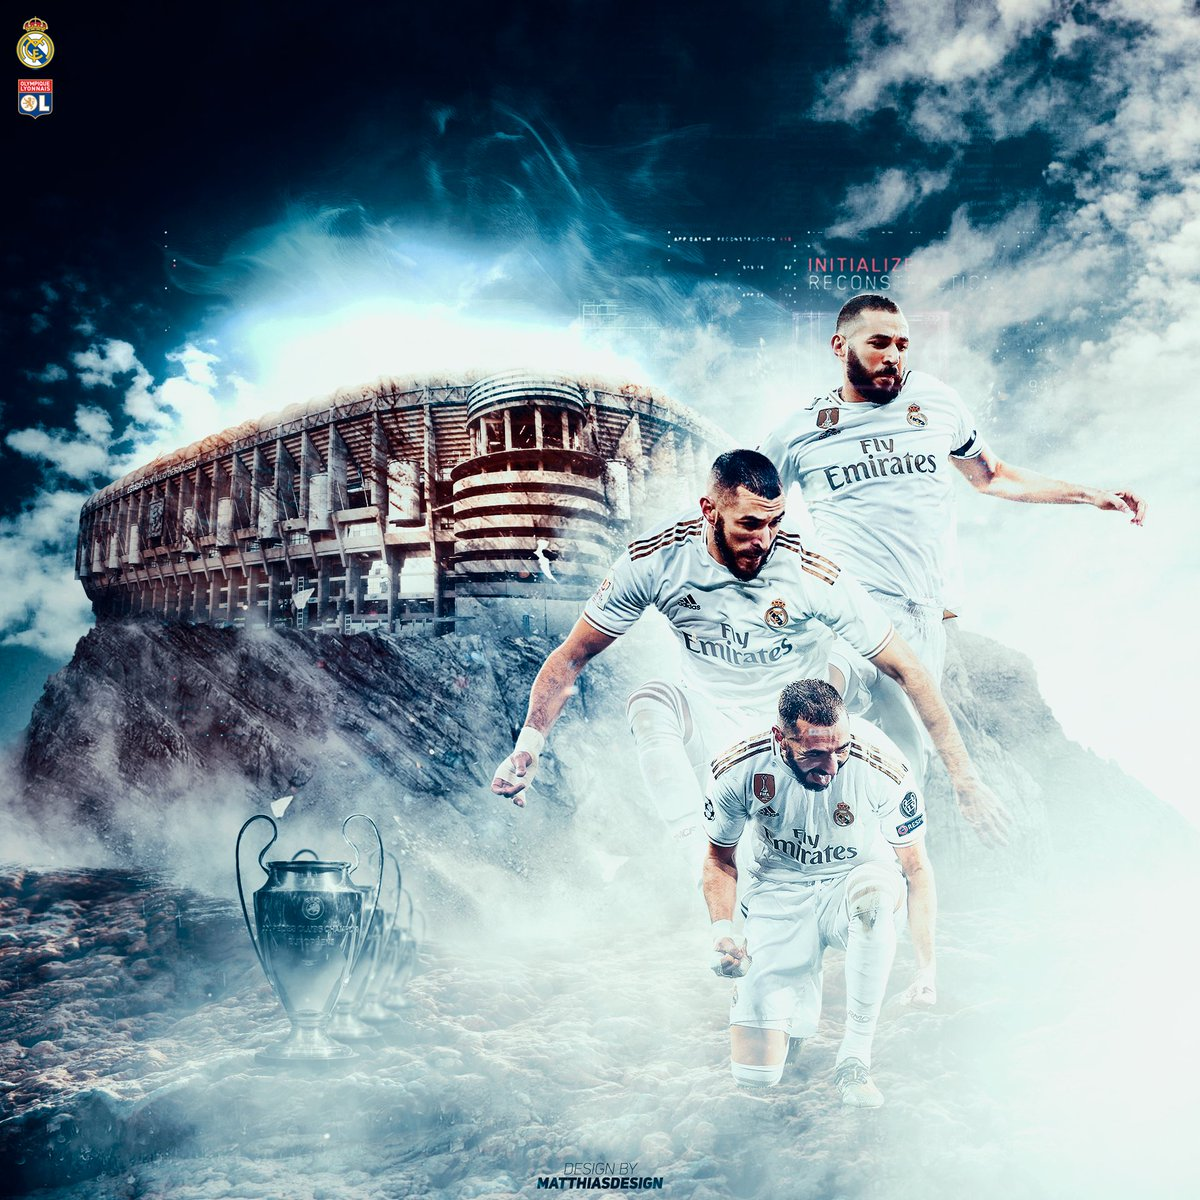 [Personal work] - @Benzema    #Share if you like it :)   #RMA #Merengues #Madrid #Benzema #OL #TeamOL